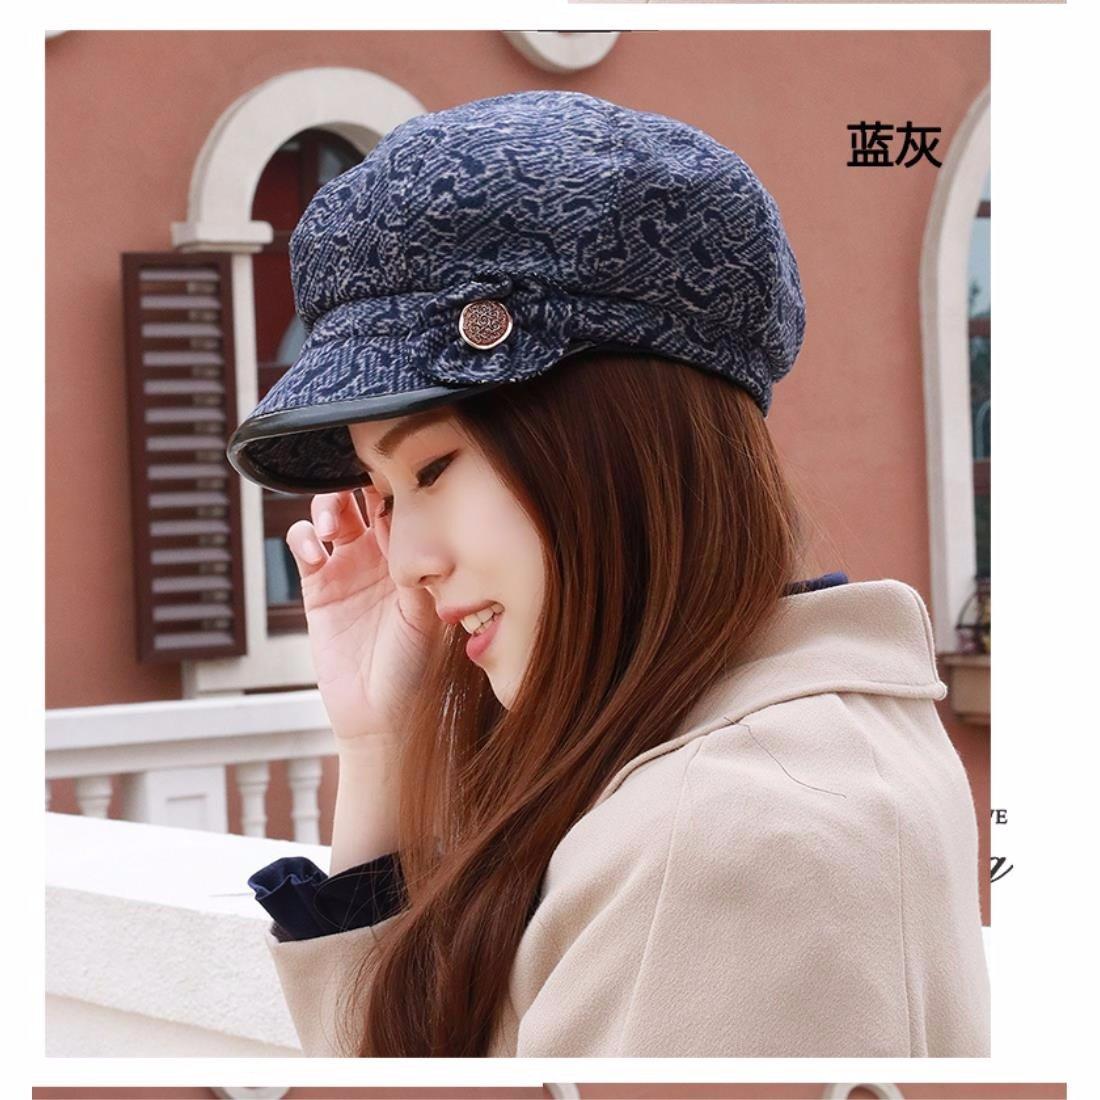 b5ea2c65b Xiaogege New productsIn the spring of older female cap hat octagonal ...